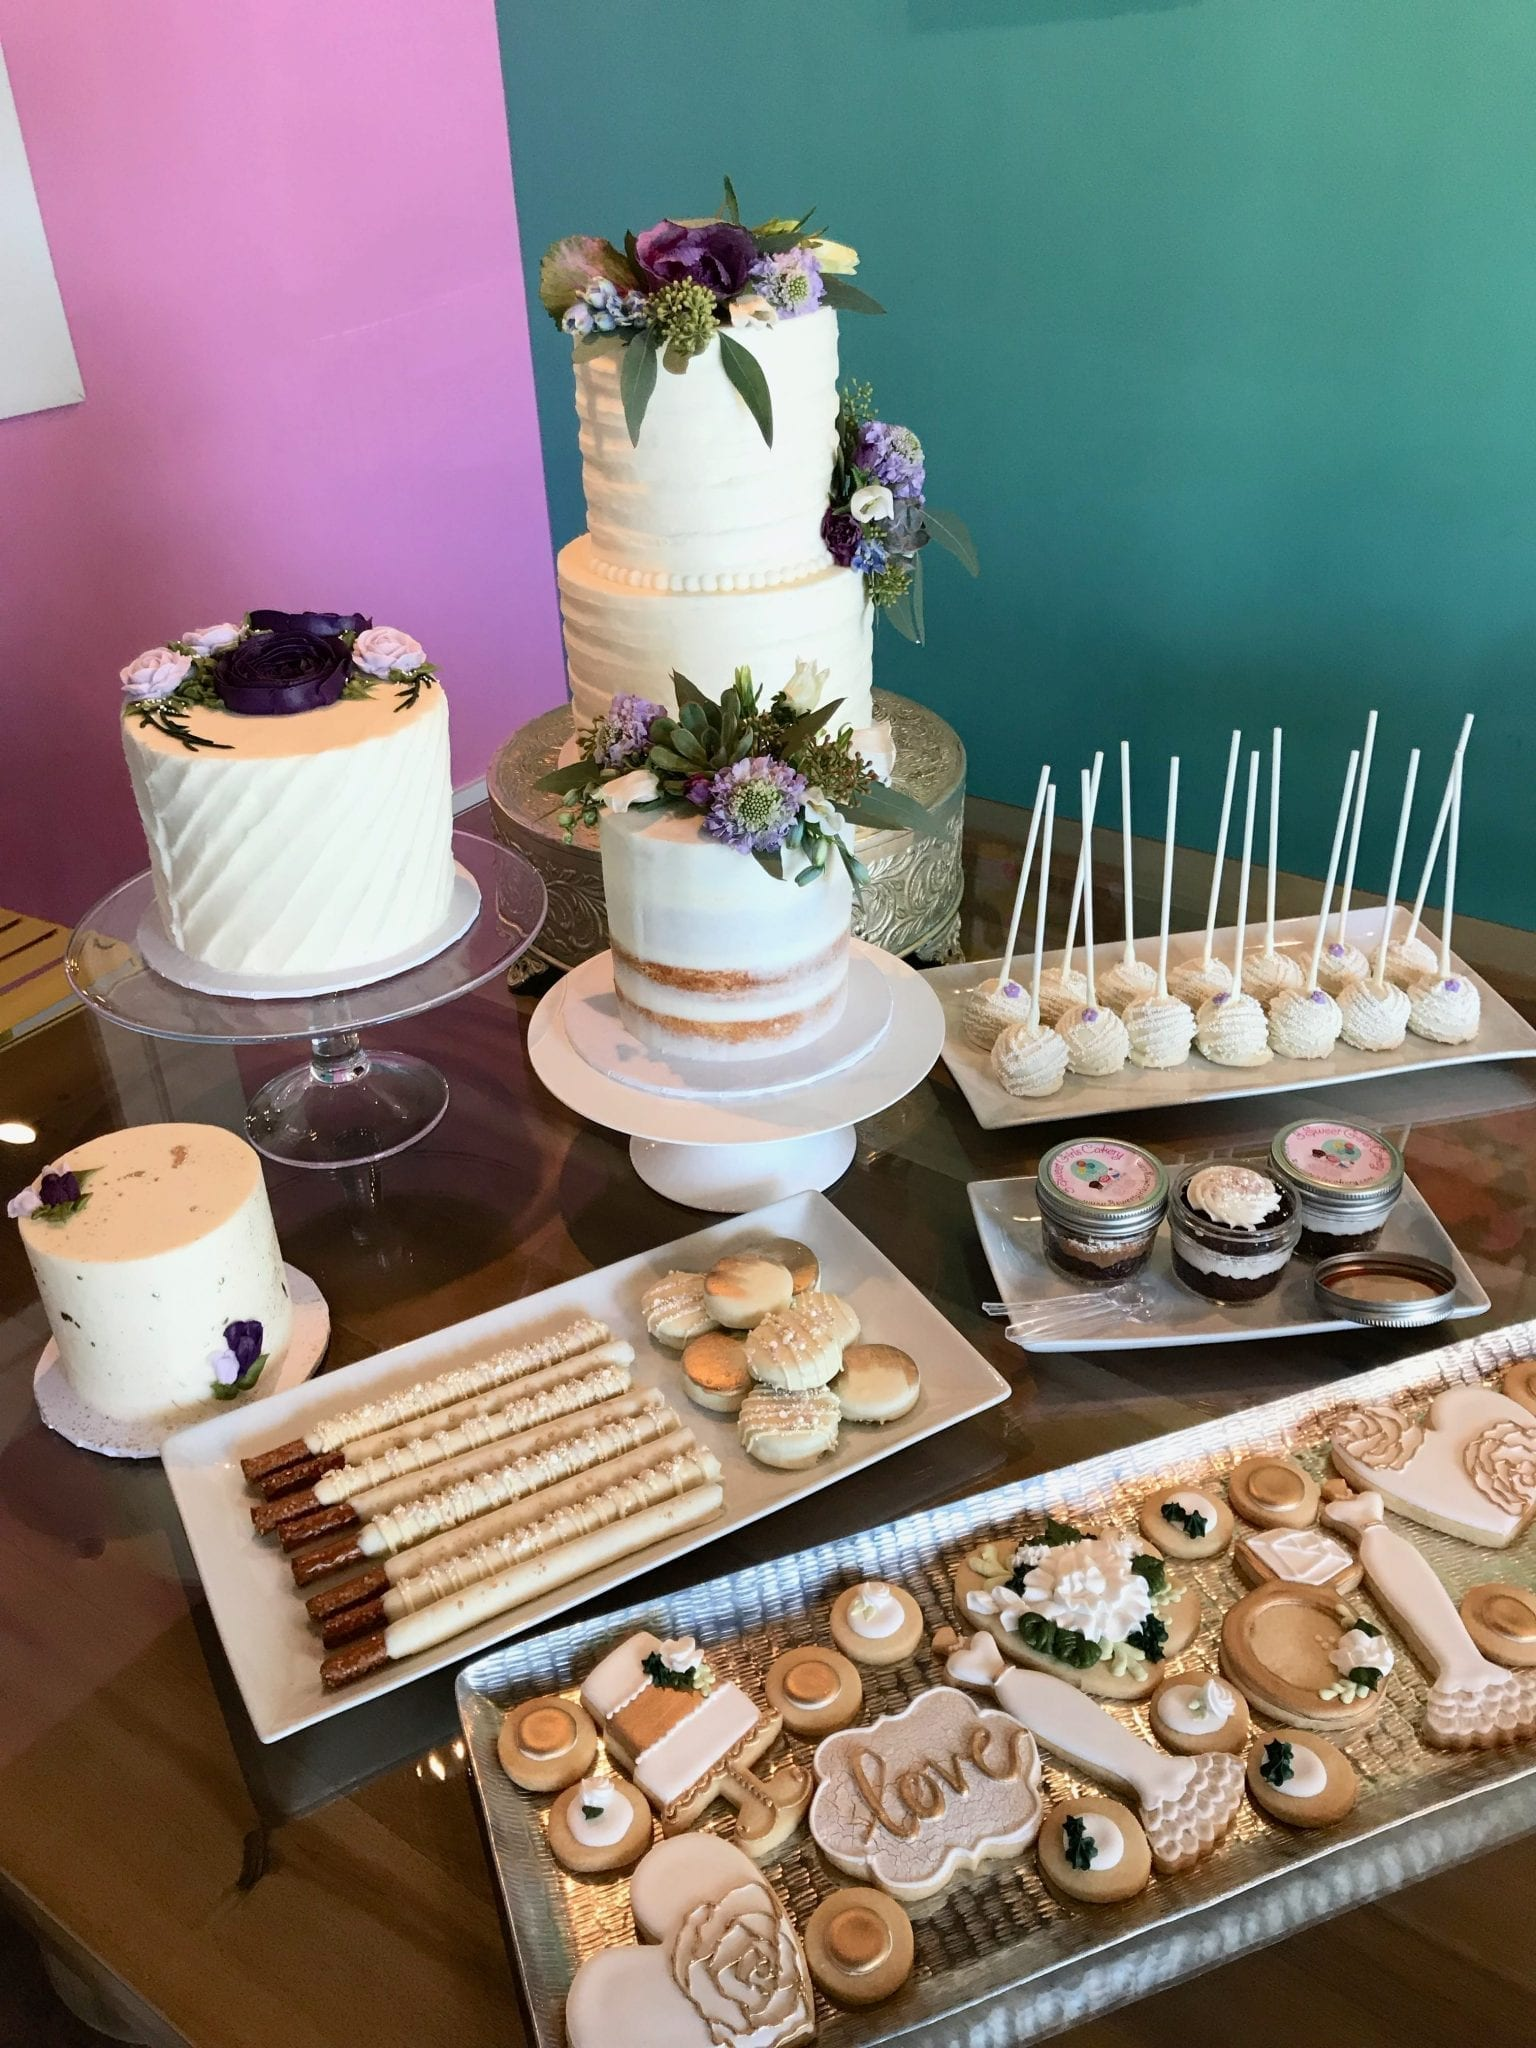 Wedding Dessert Display at 3 Sweet Girls Cakery | 3 Sweet Girls Cakery